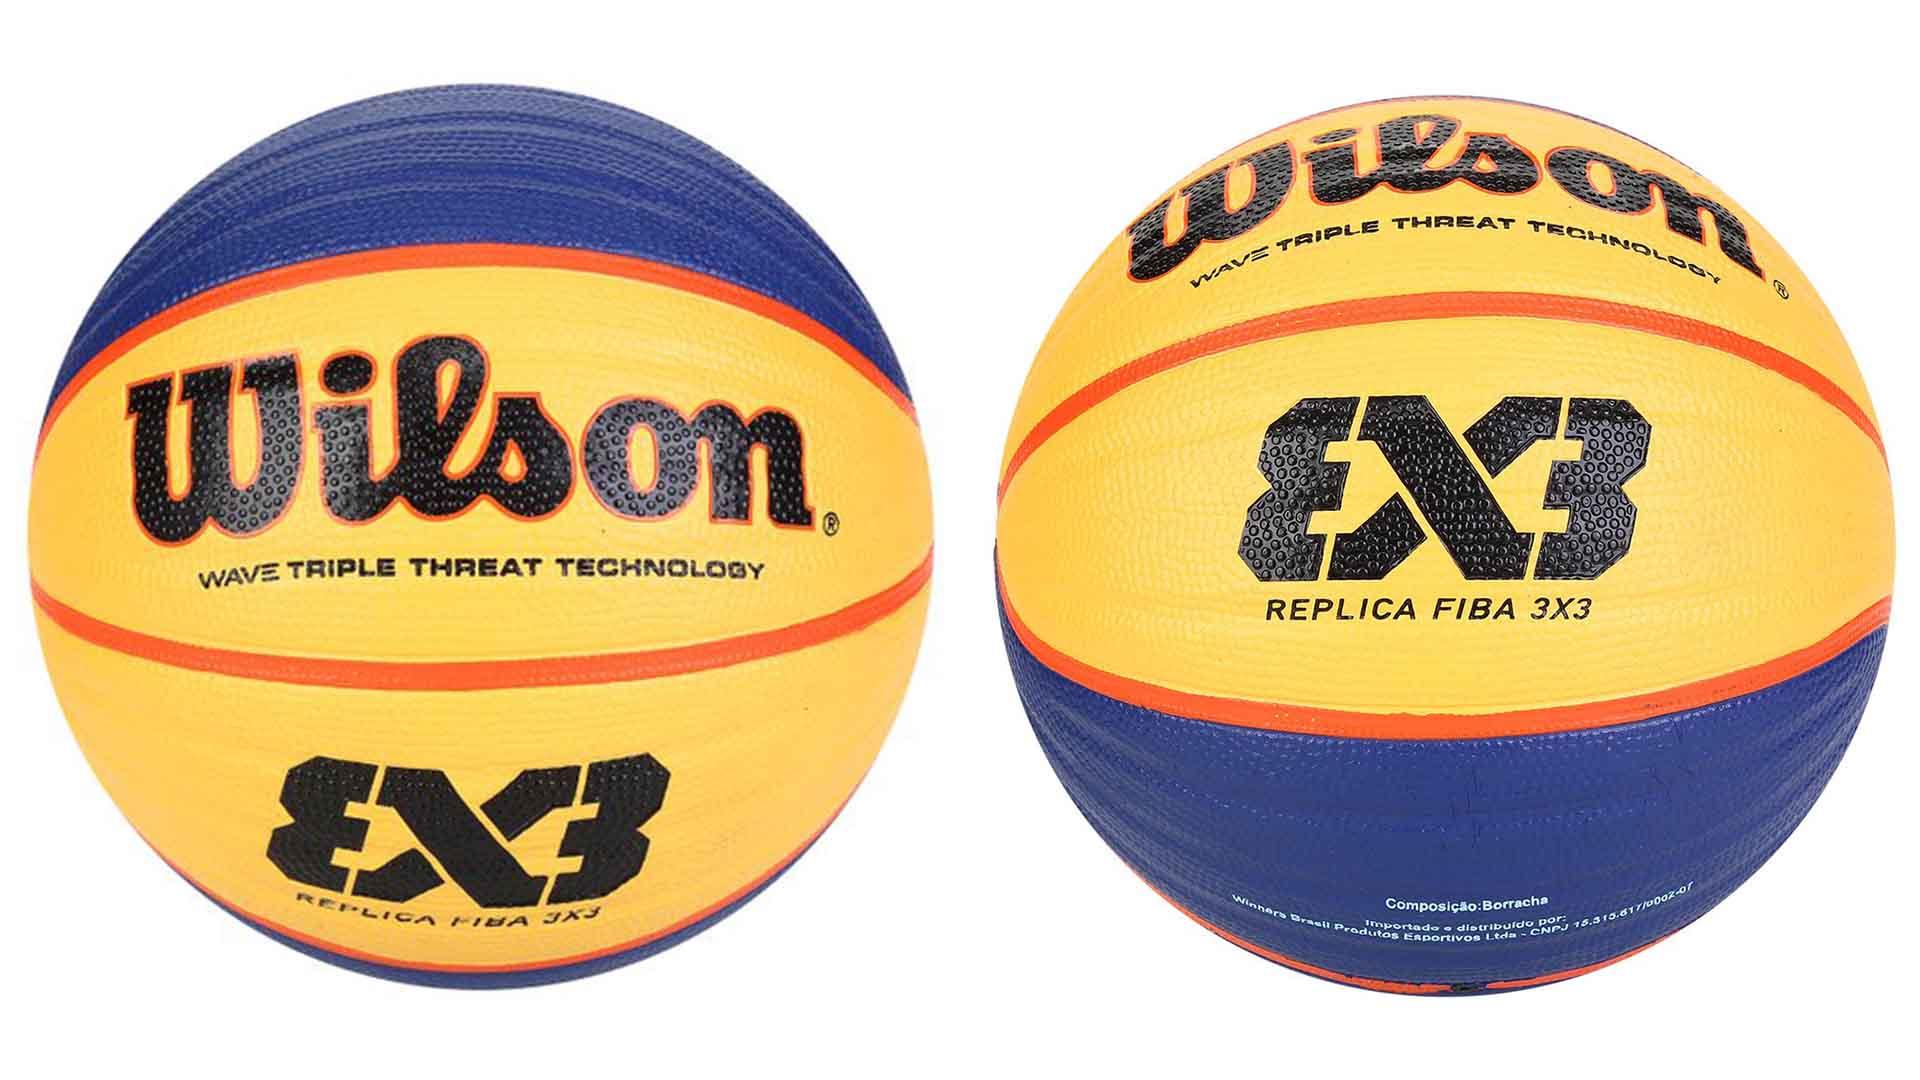 Bola Wilson Réplica FIBA